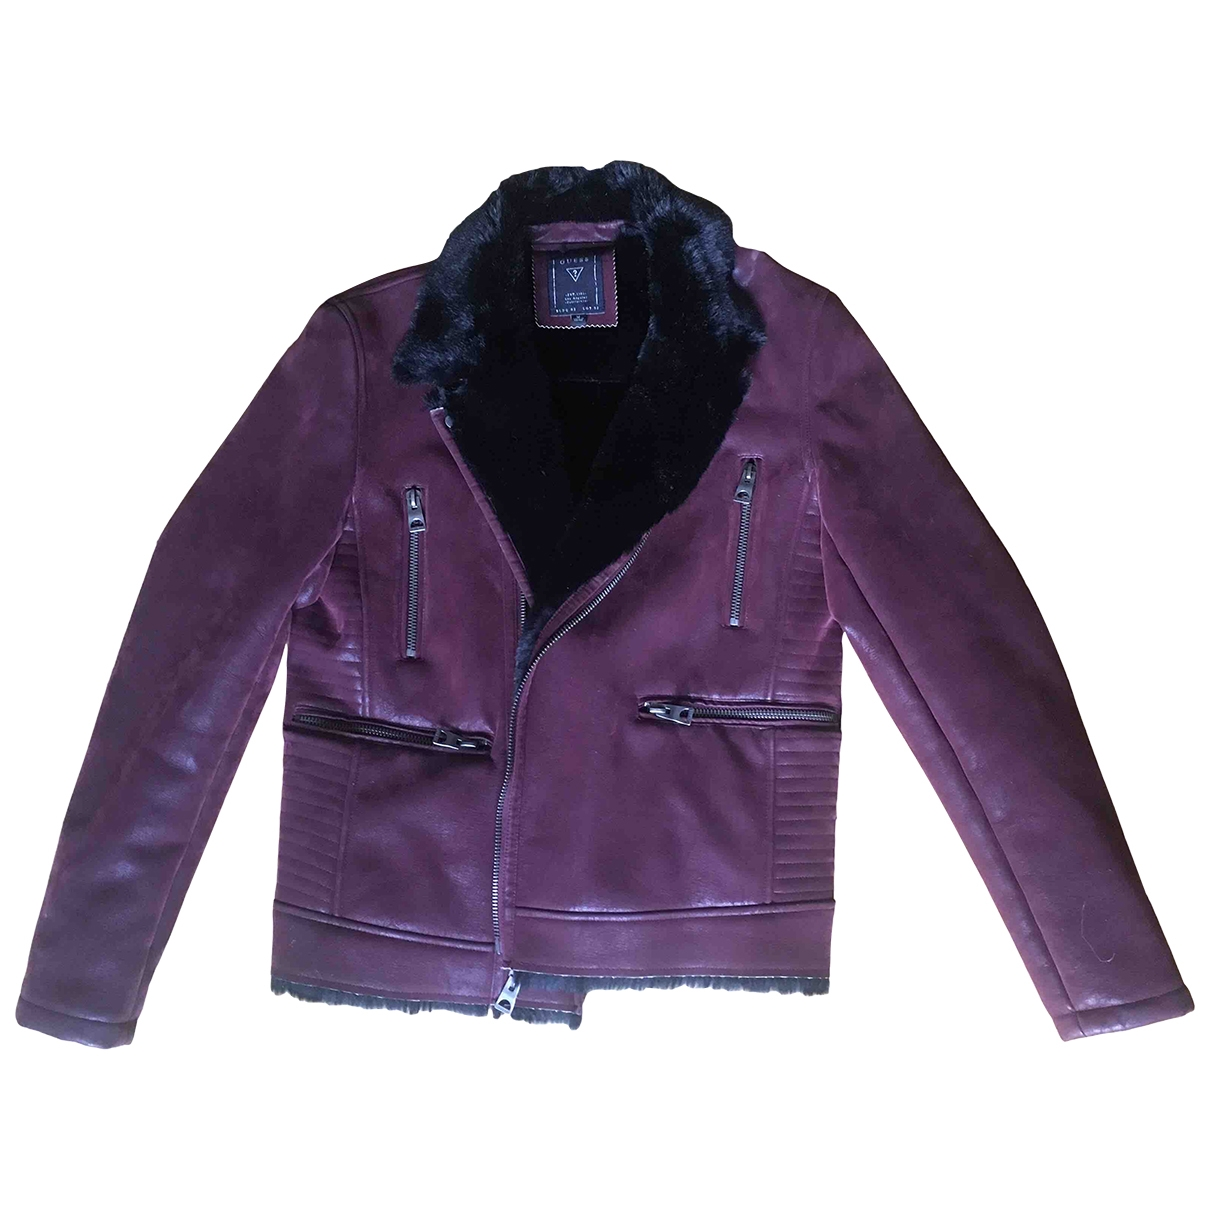 Guess \N Burgundy coat for Women M International